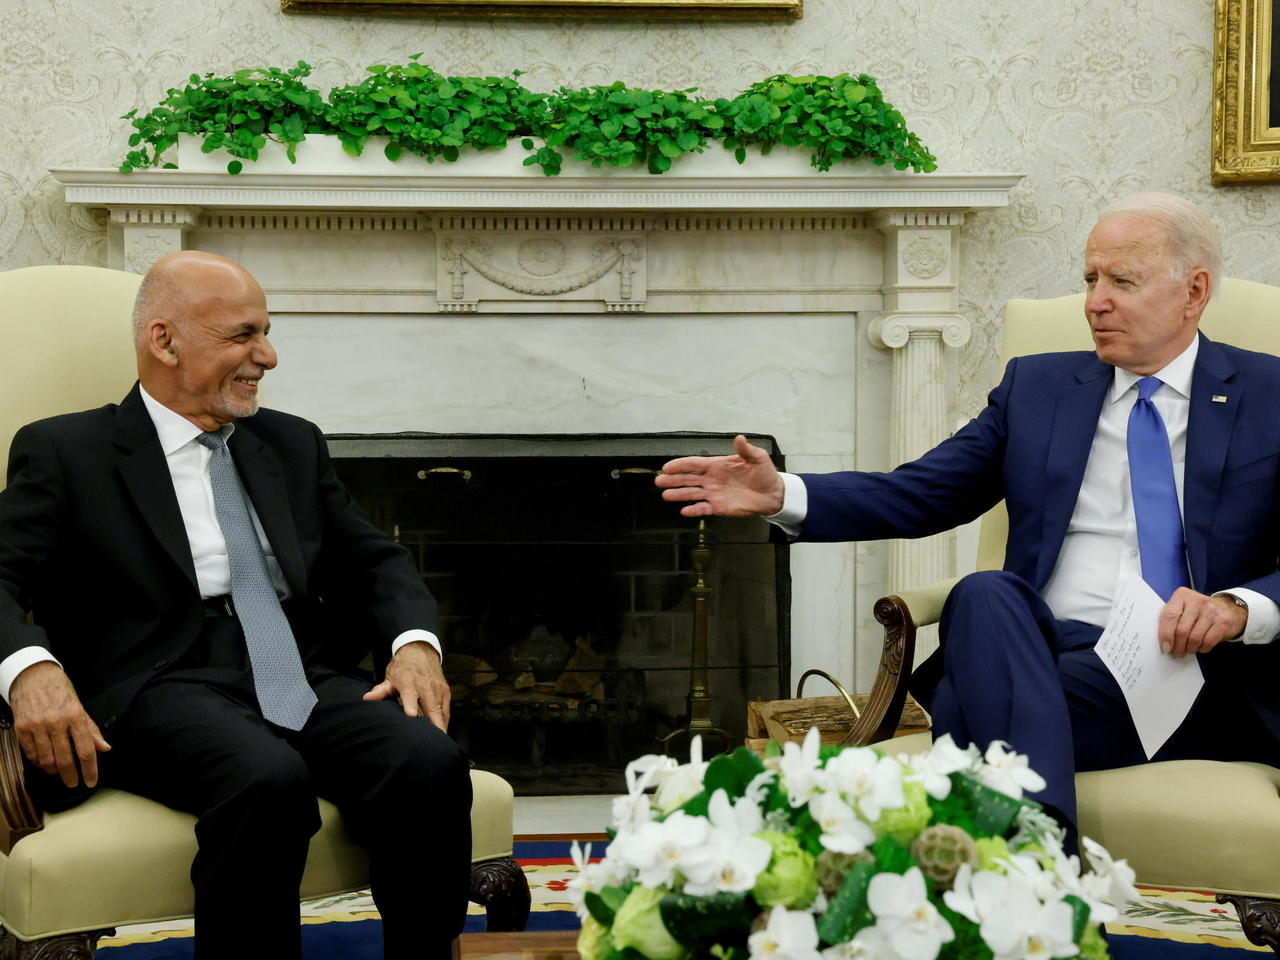 Afghan Ashraf Ghani (Left) And U.S President Joe Biden